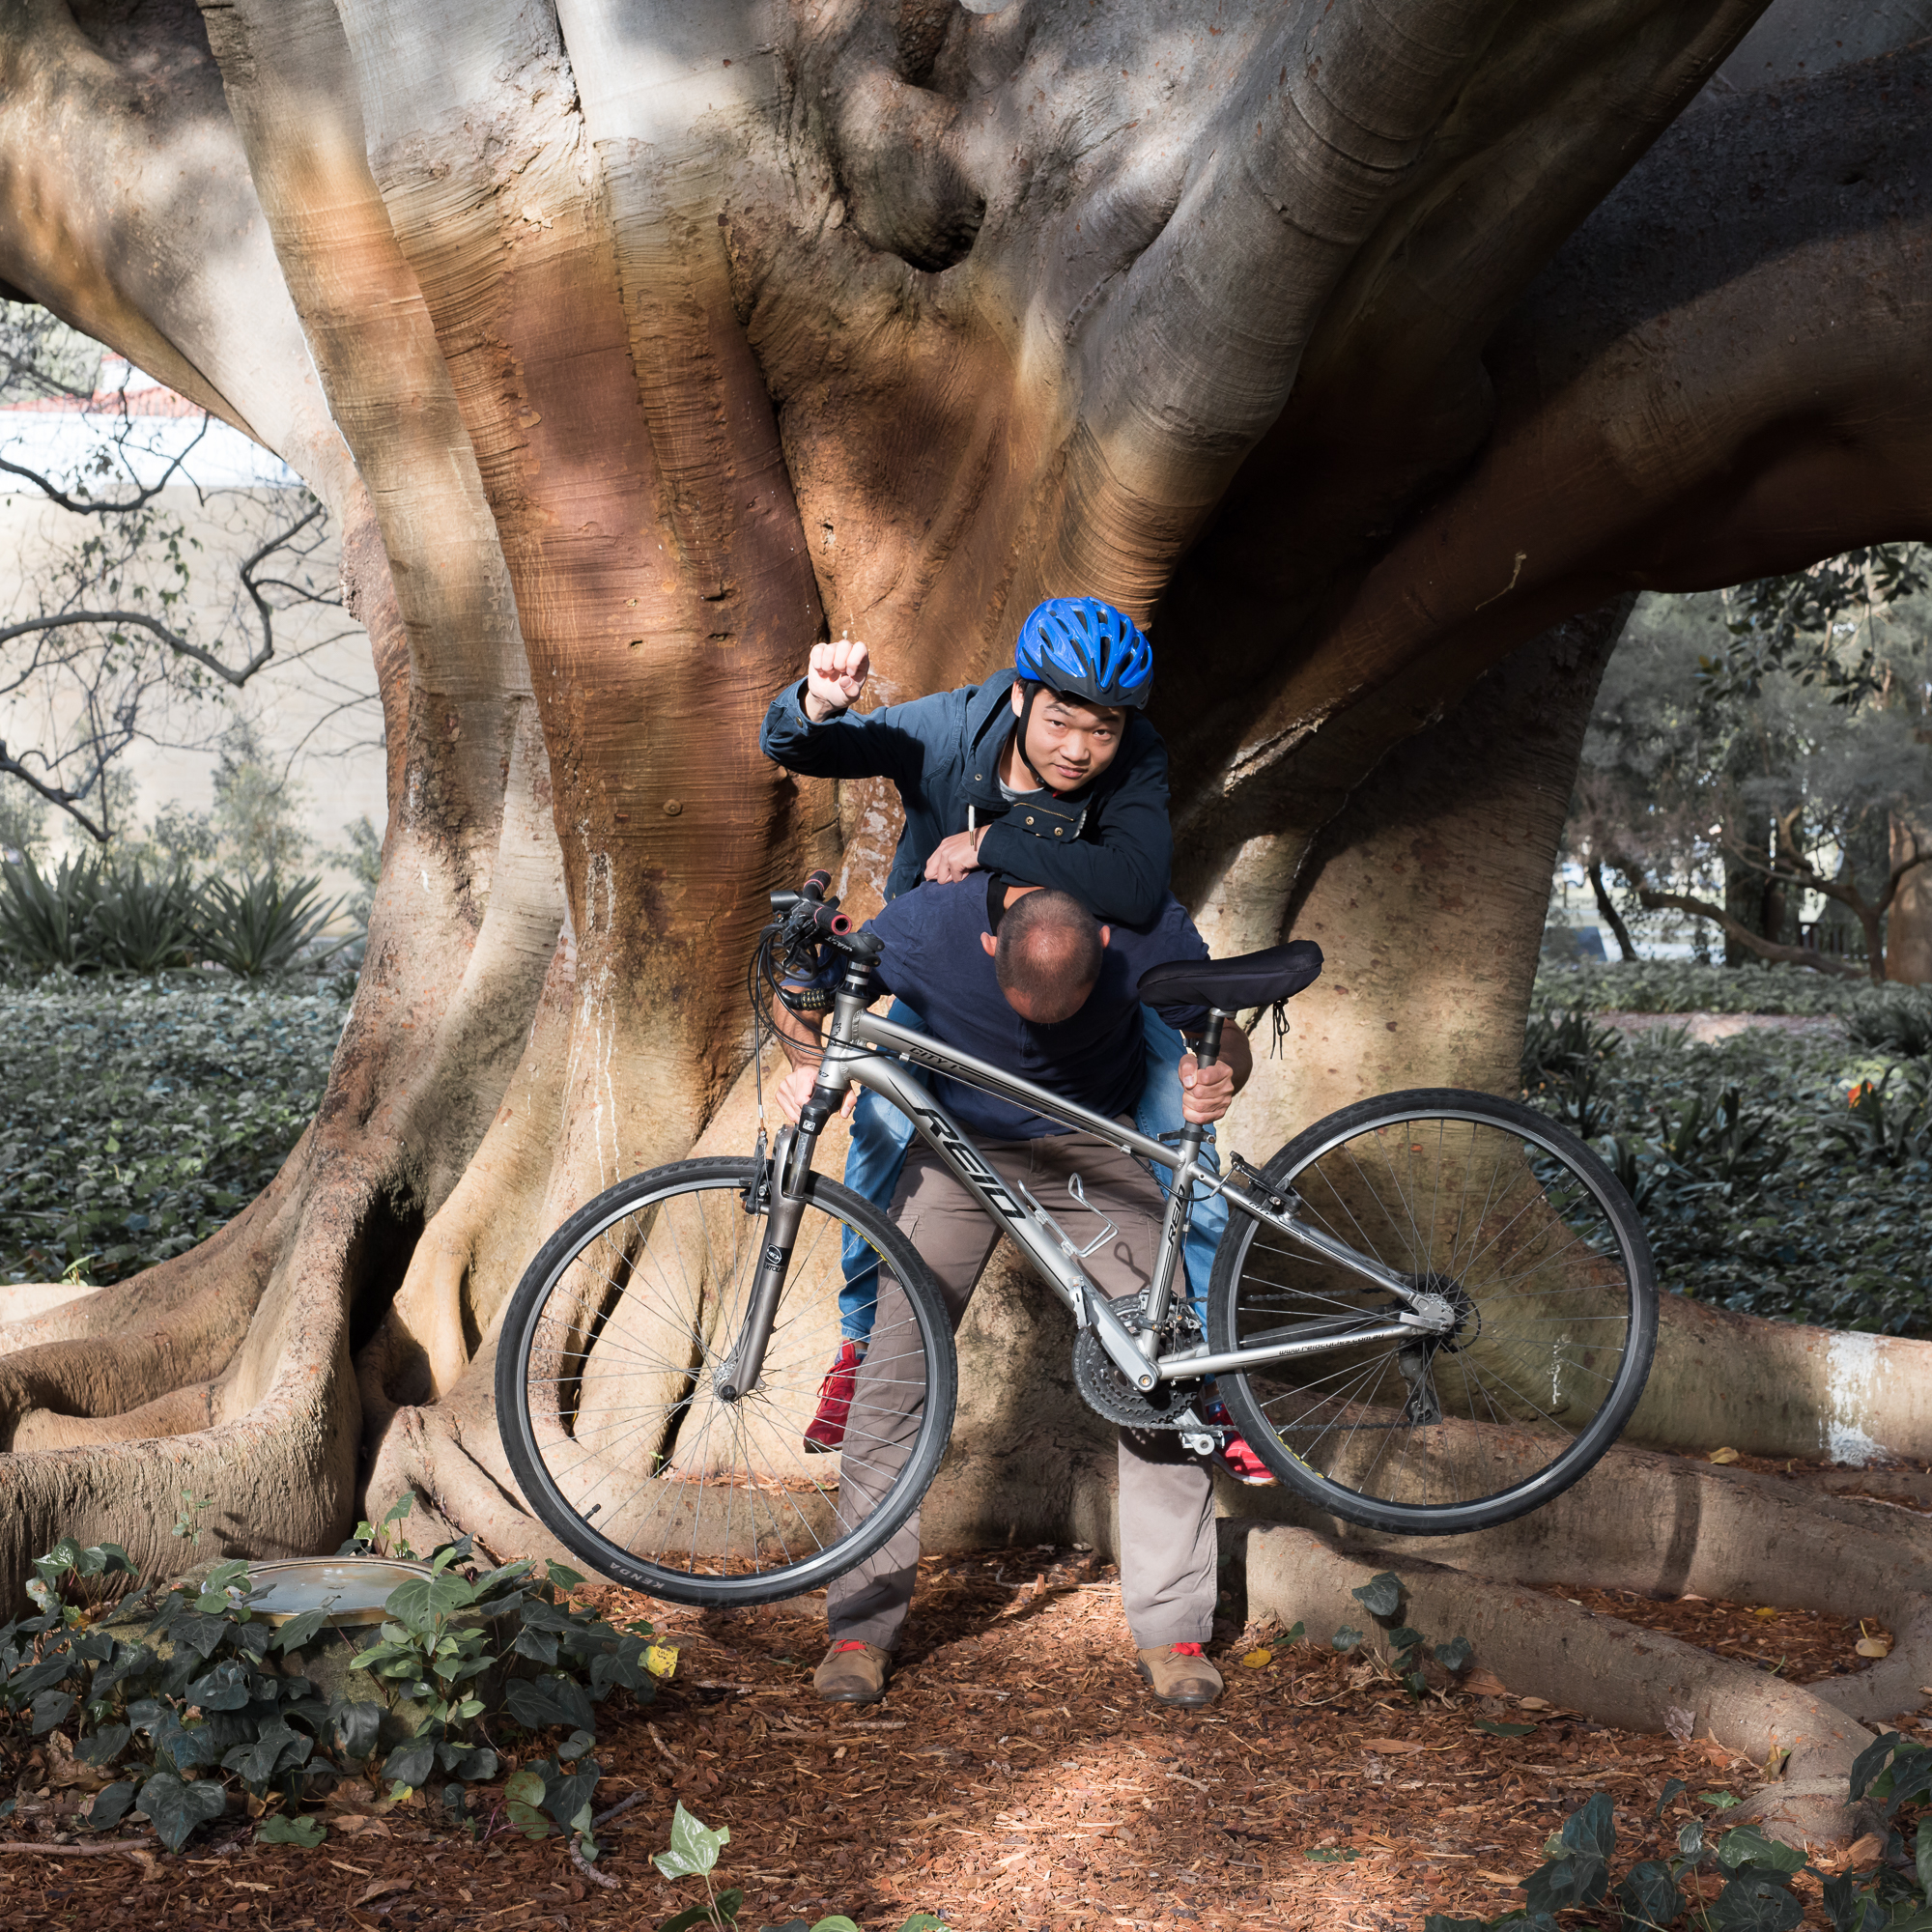 Perth University - Bicycle jousting